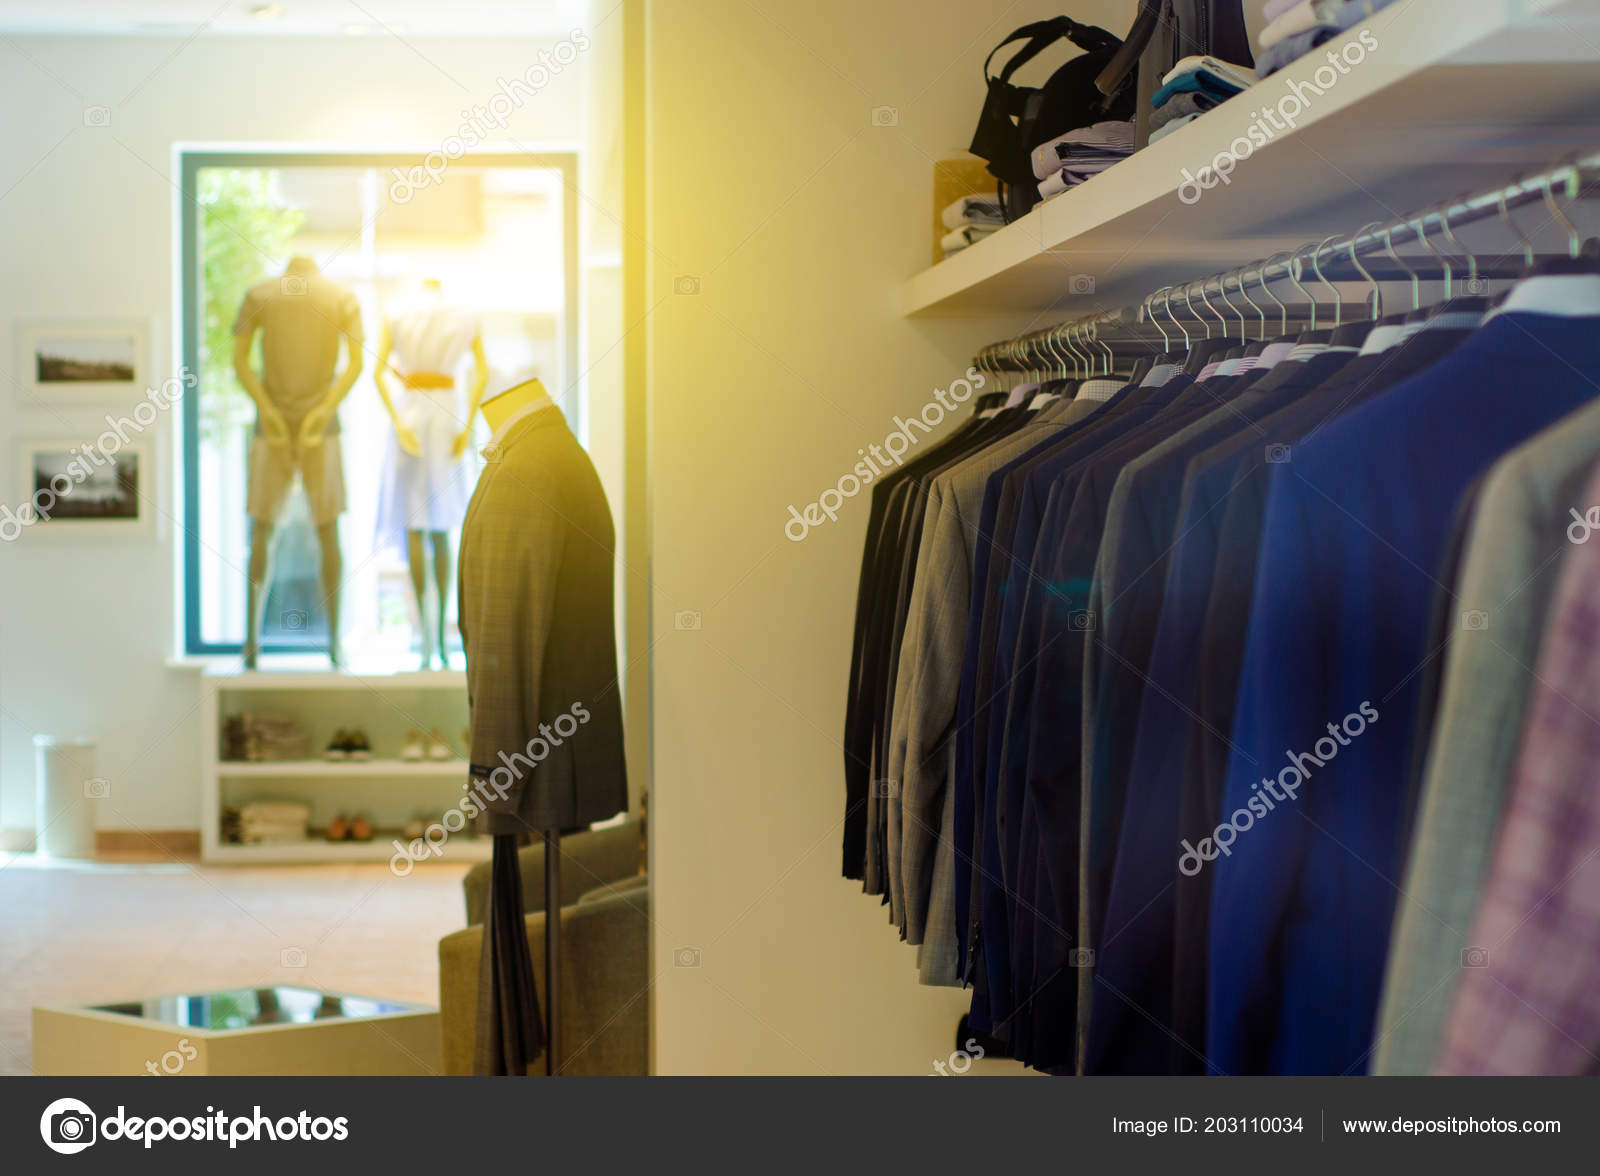 ff2b7c7d136b Ράφι με κρεμάστρες άνθρωπος Ρούχα ανδρικά μανεκέν κατάστημα μόδας — Εικόνα  από Evgenyjs1